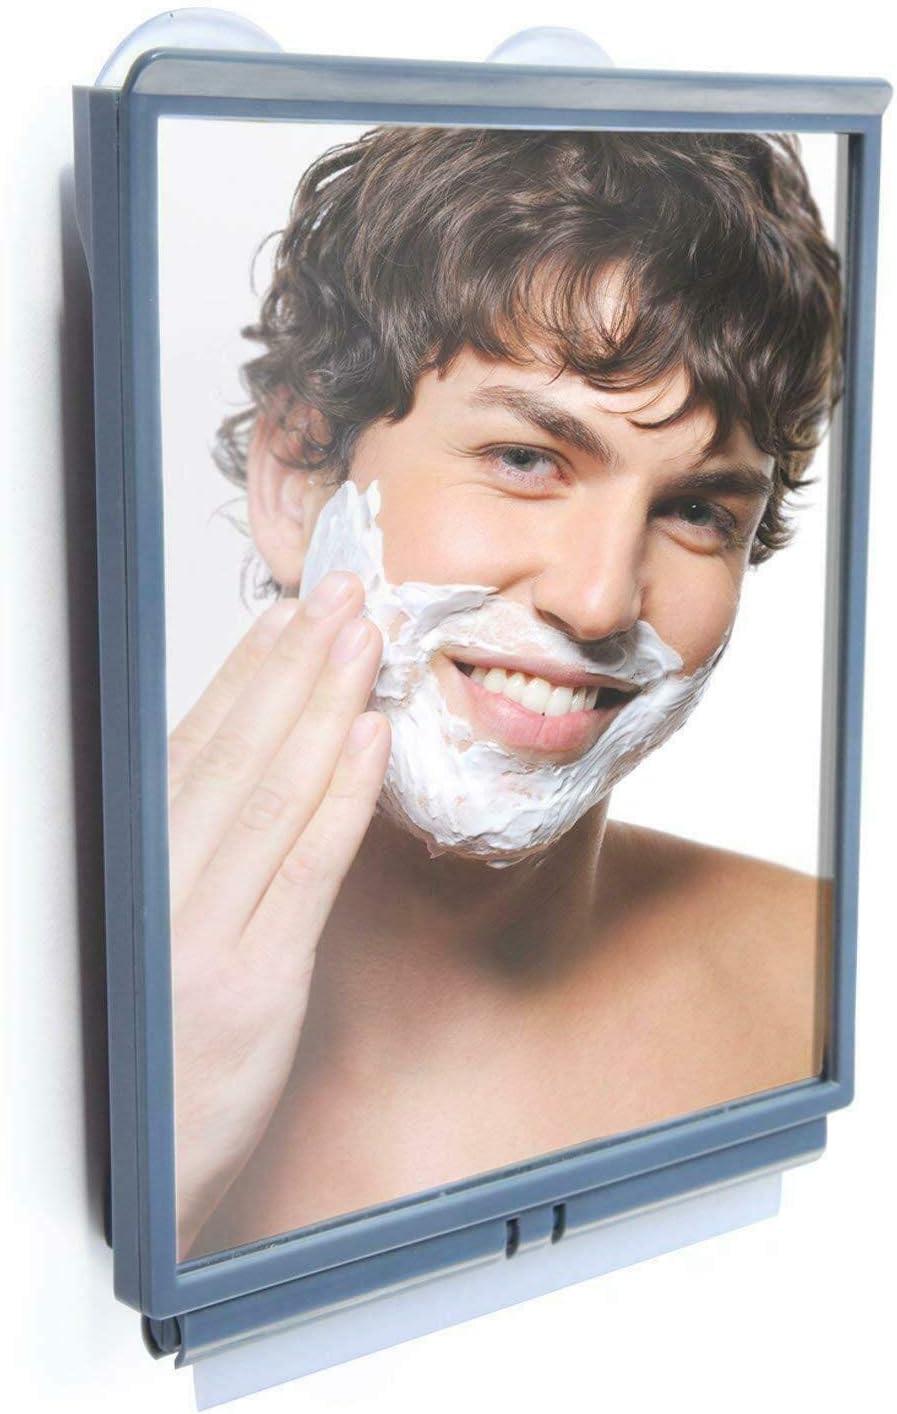 Cheap mail order shopping Travel Dorm Fogless Shower Shaving Seasonal Wrap Introduction Mirror Ba for Bathroom